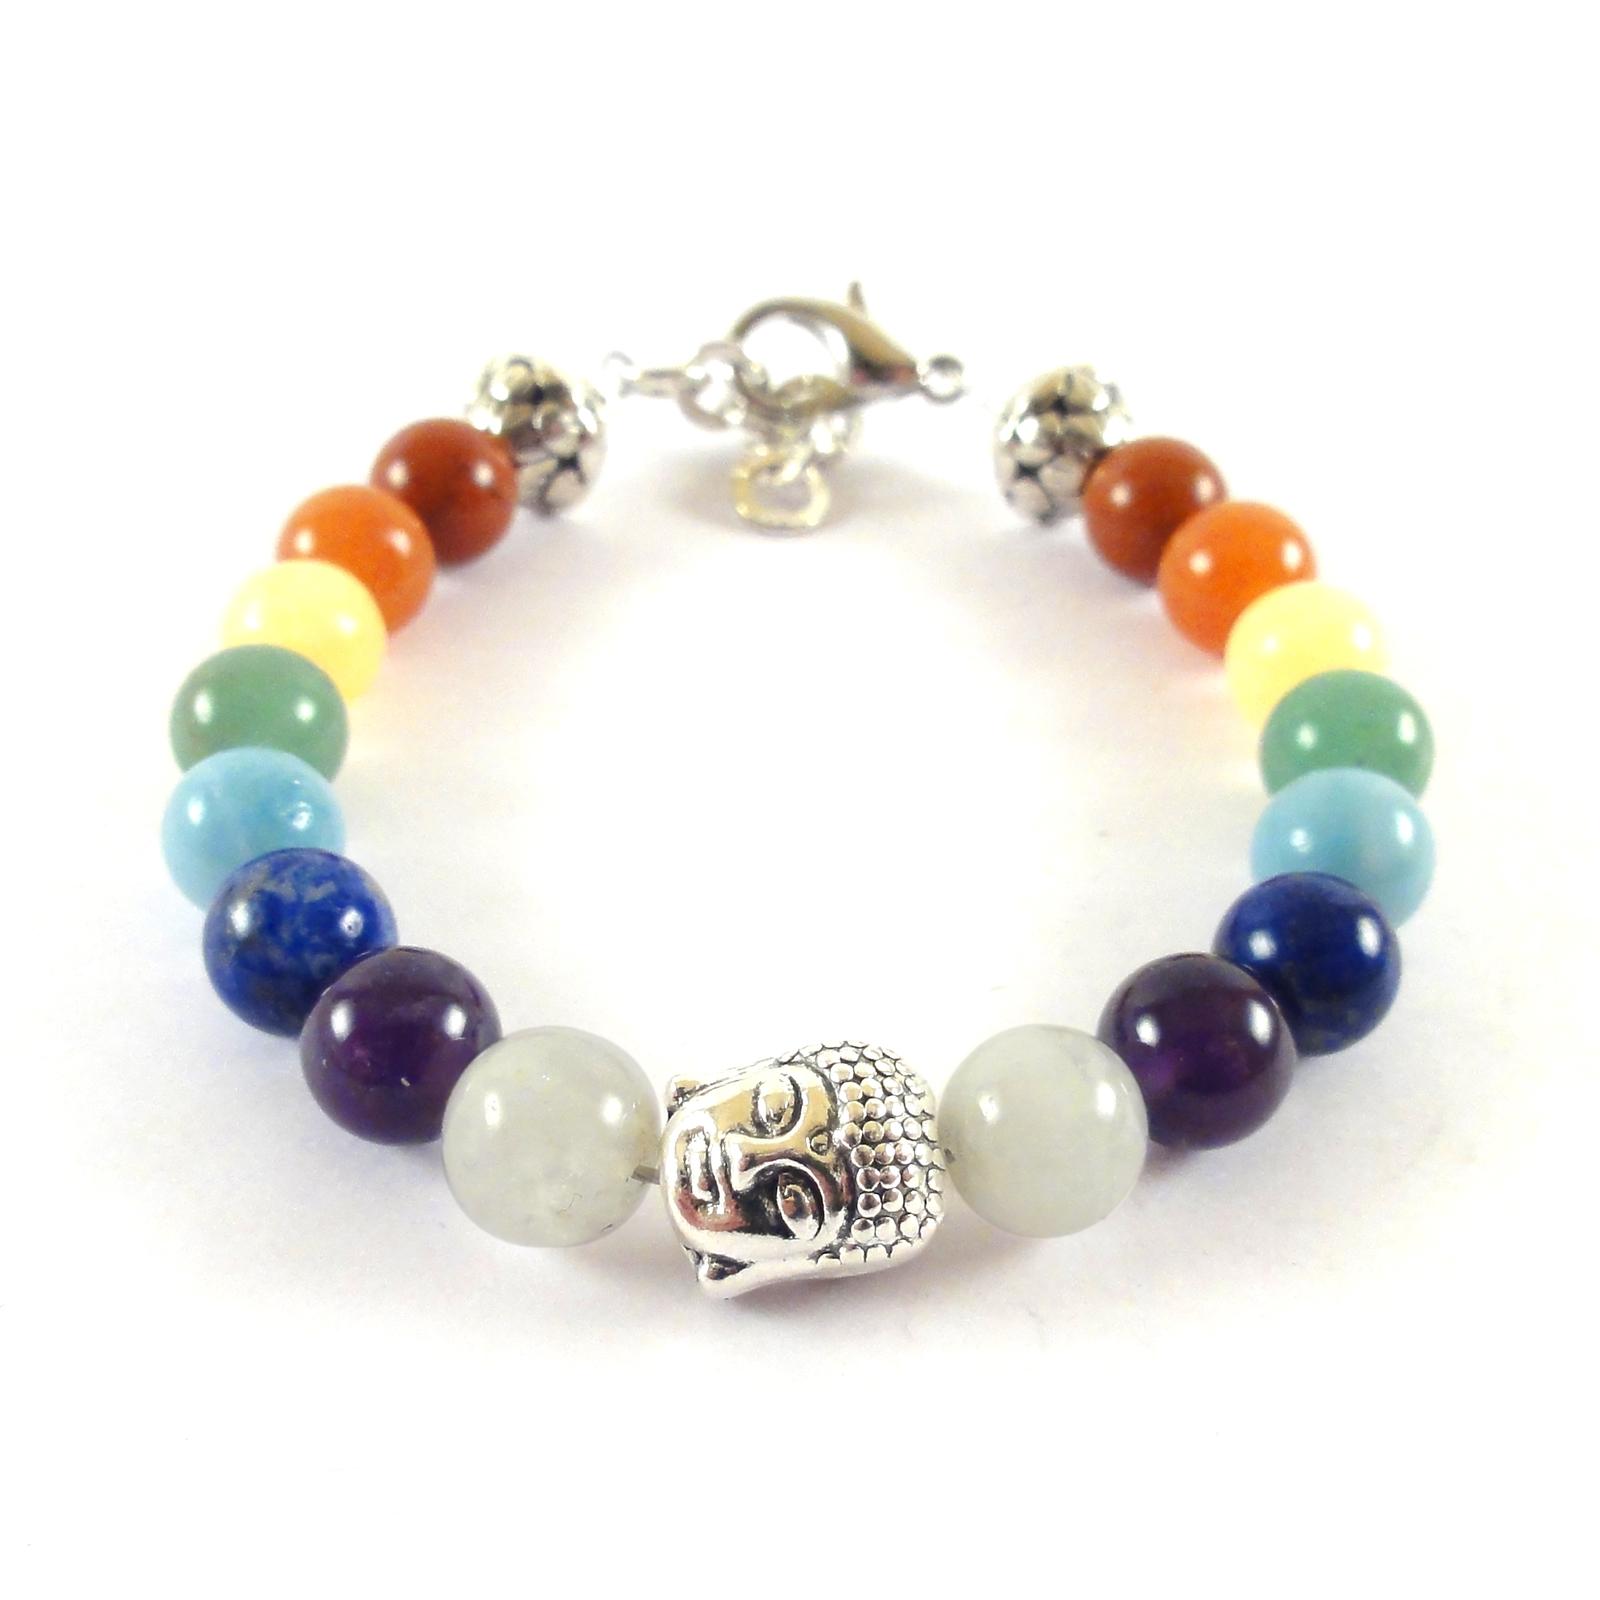 7 Chakra Natural Gemstones Bracelet Handmade with Buddha charm